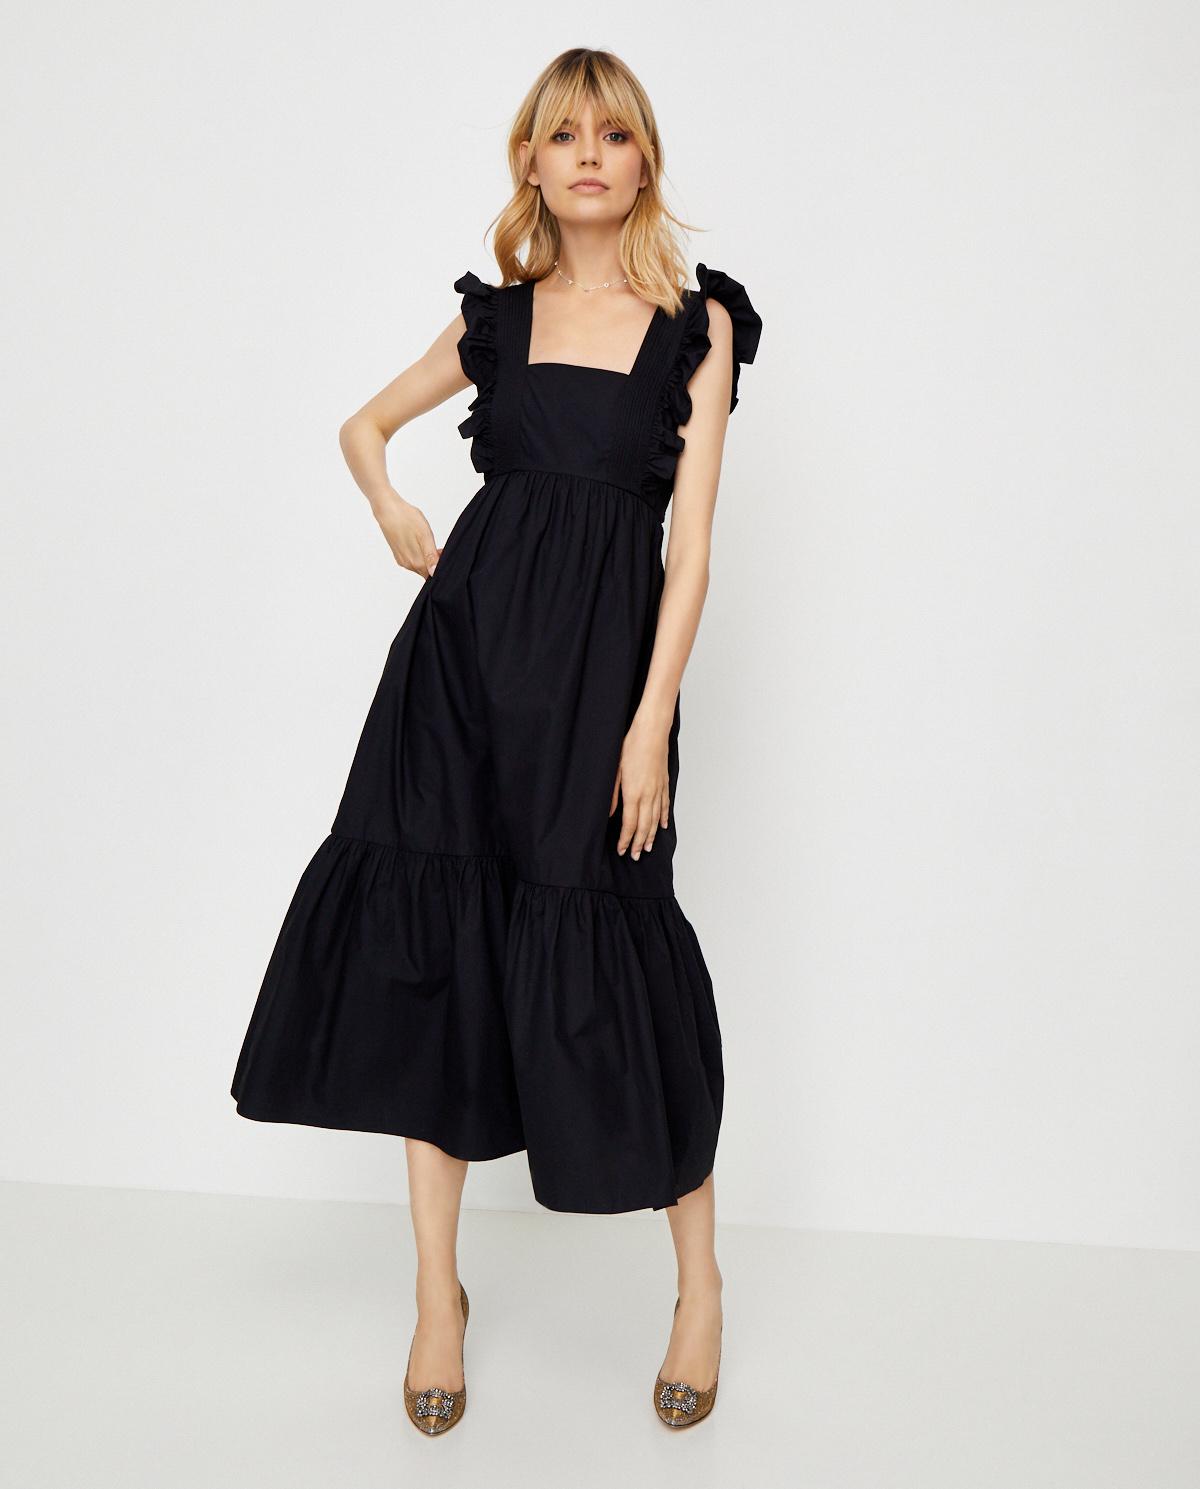 Czarna sukienka midi z falbanami Self-portrait SS20-014B BLACK